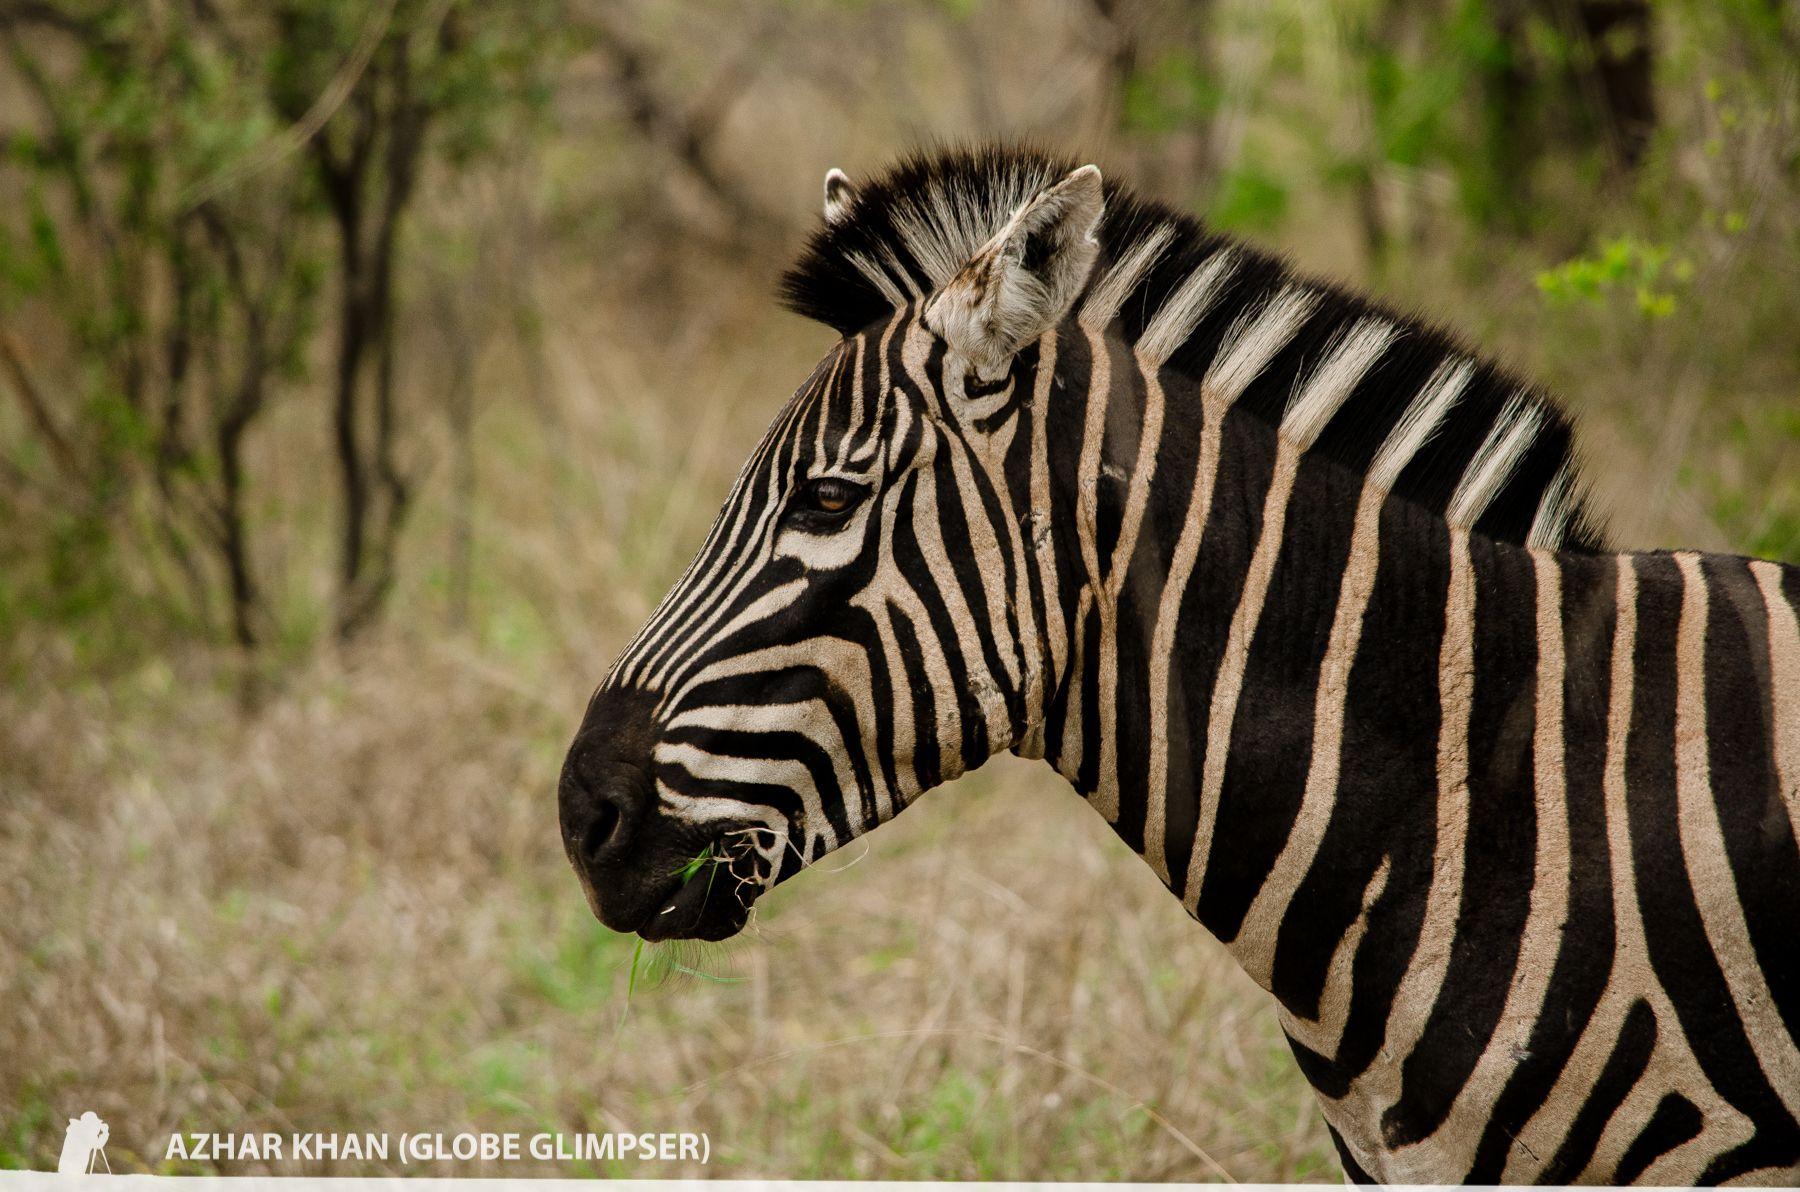 Zebra Portrait, Kuname, karongwe, South Africa